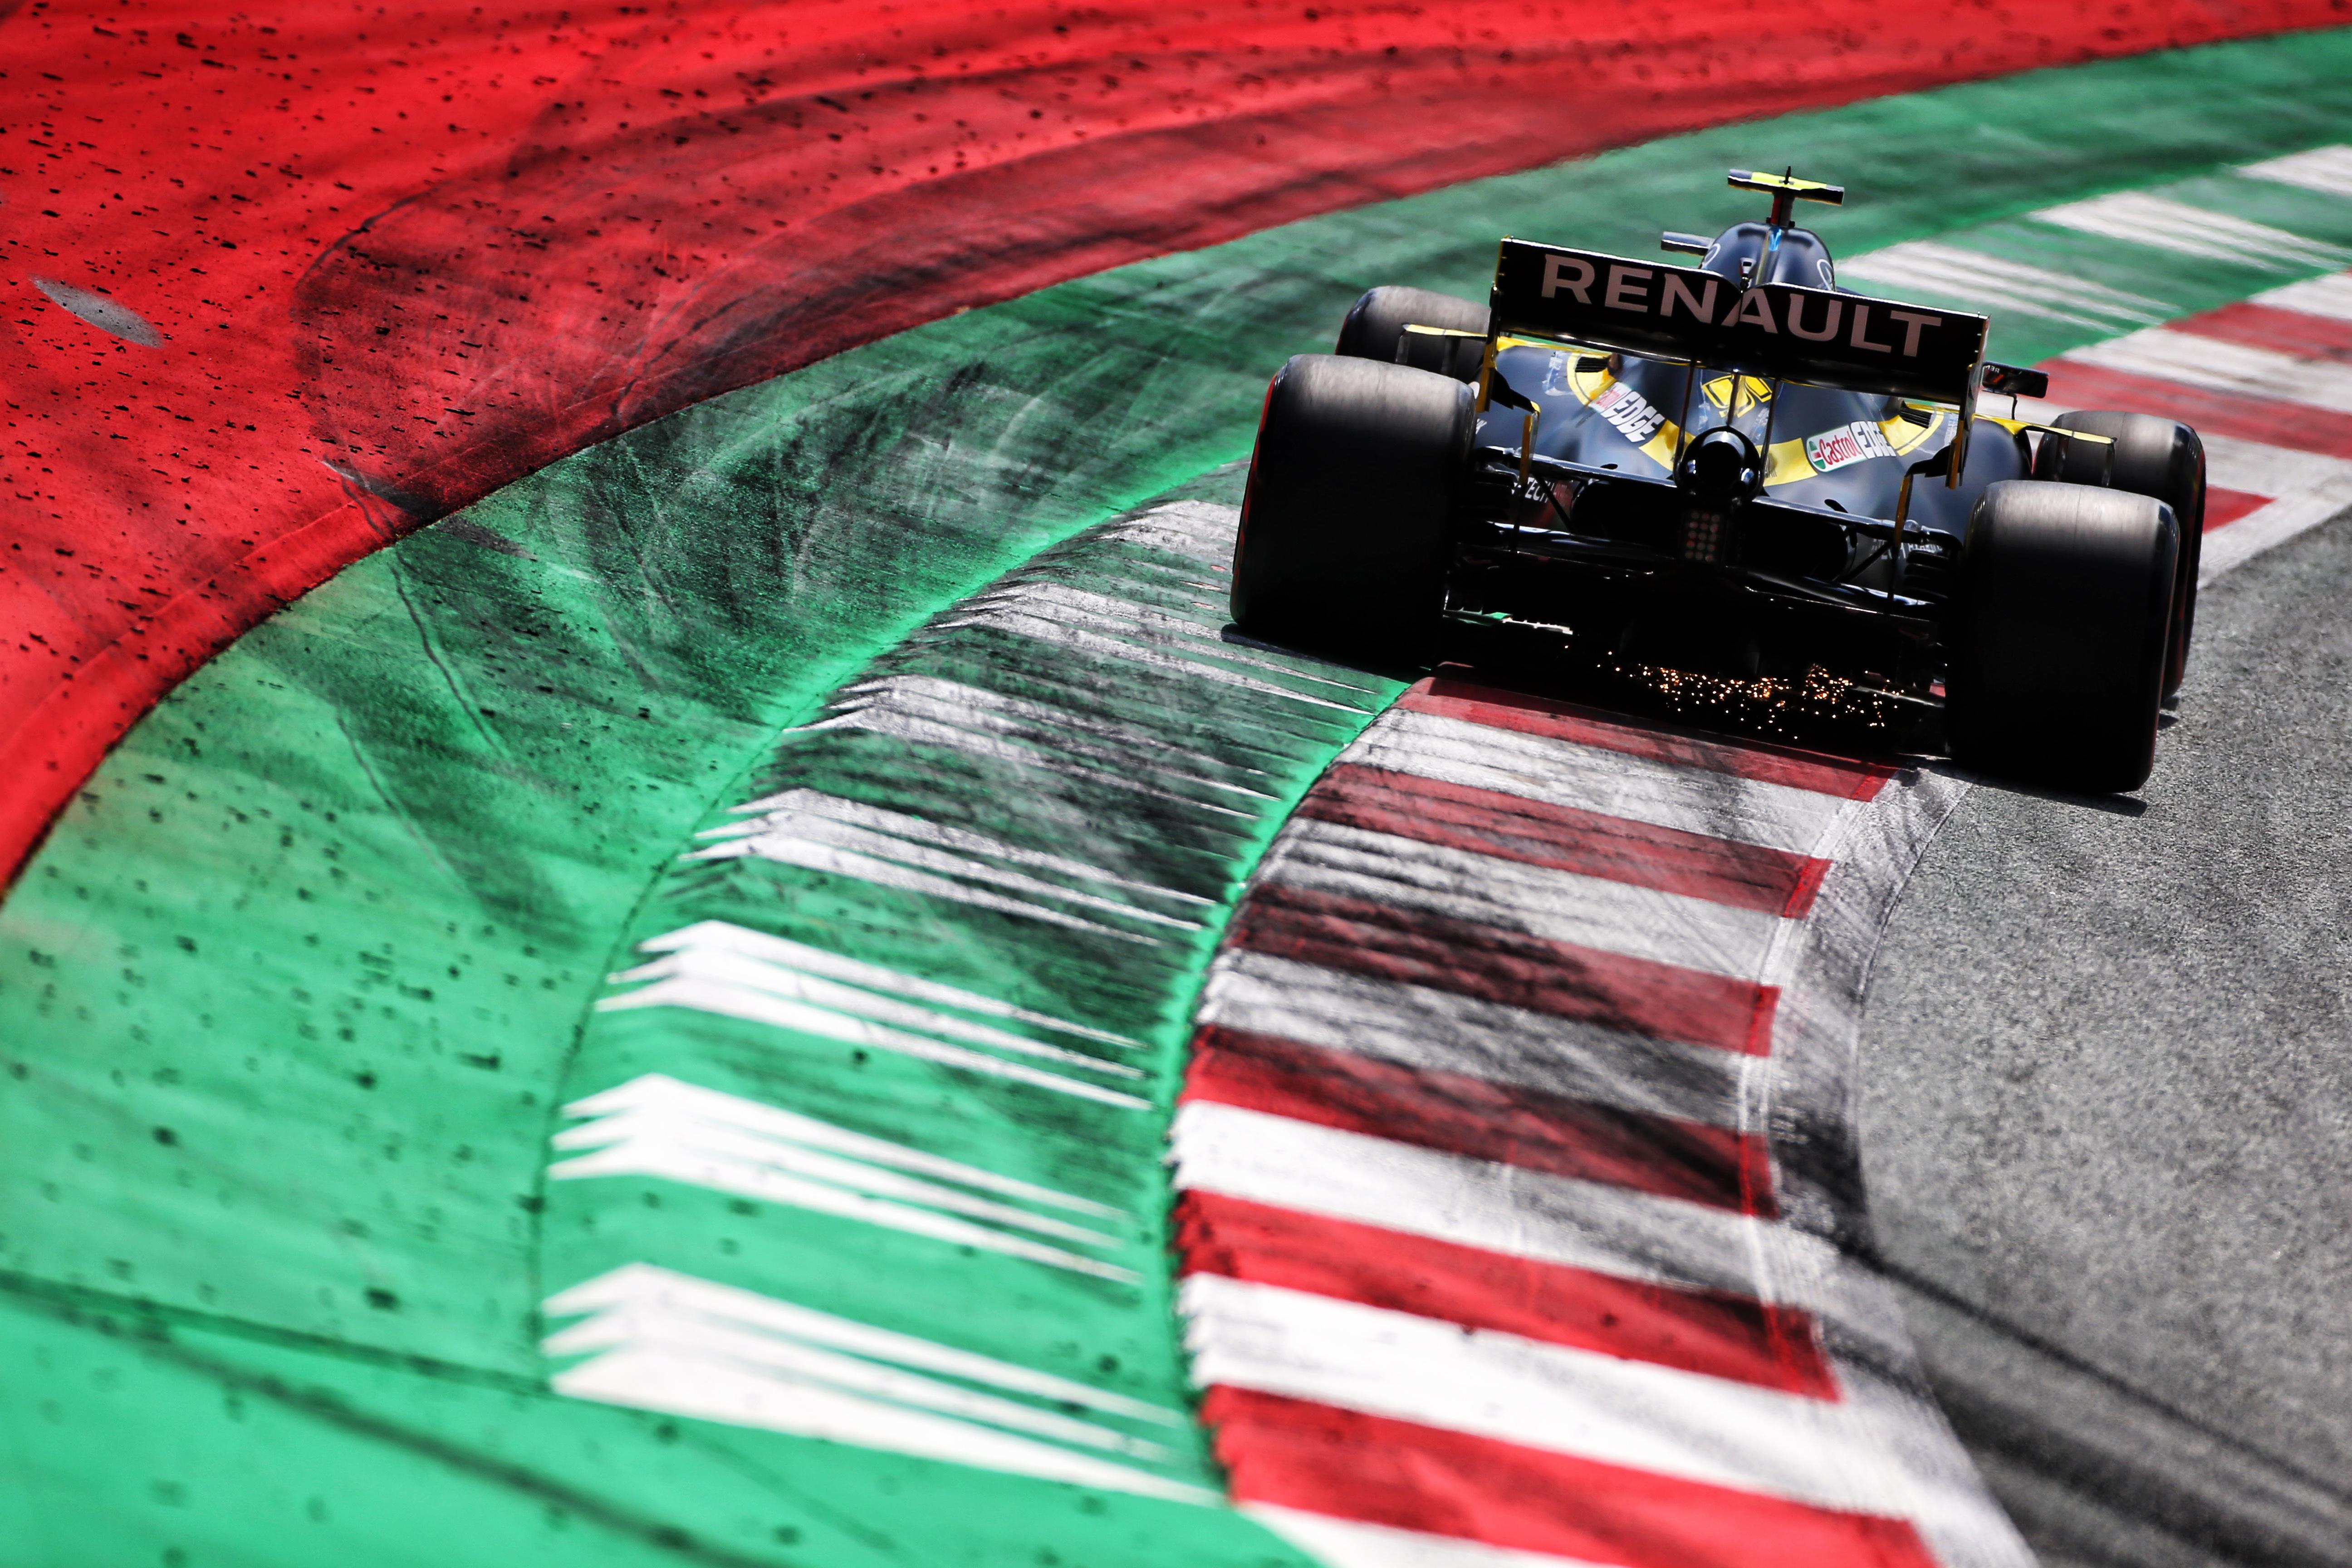 Renault F1 rear shot Red Bull Ring kerbs 2020 Austrian Grand Prix